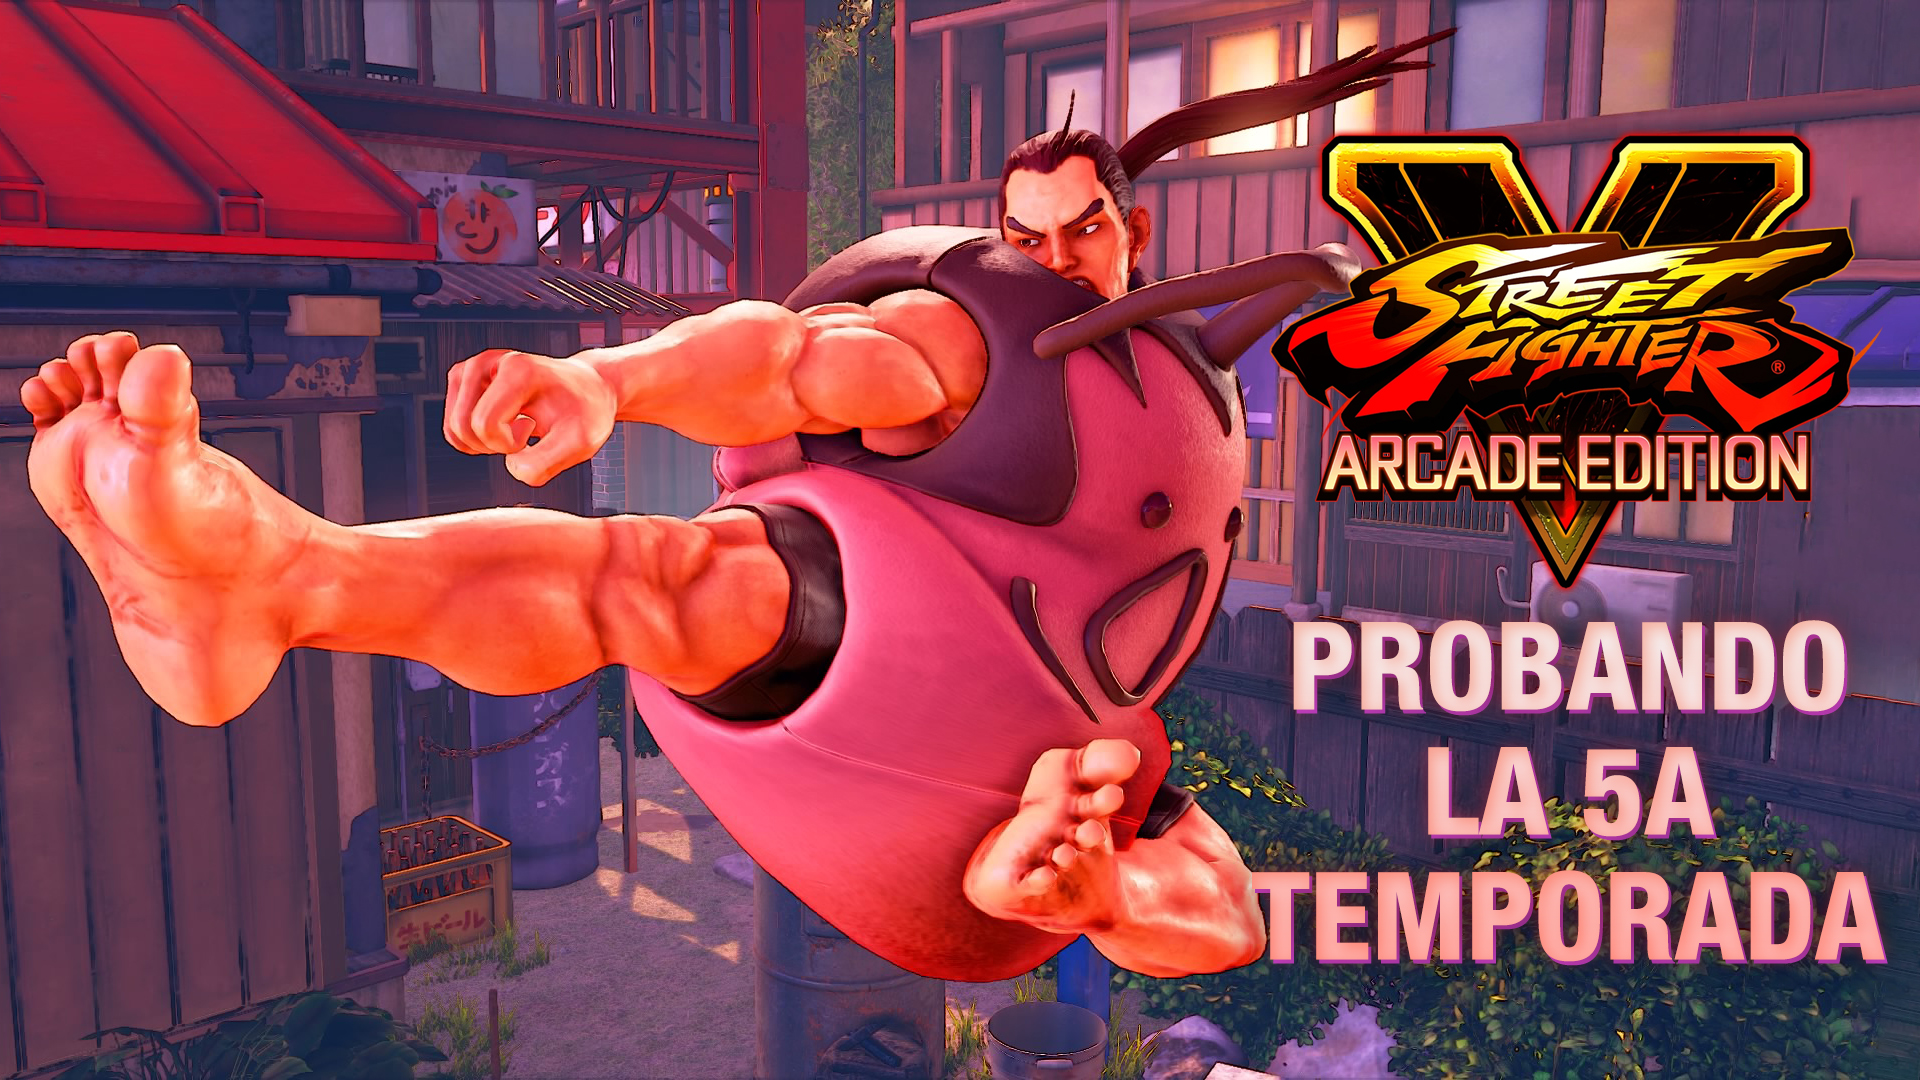 Street Fighter V: Champion Edition – Probando la 5ta temporada